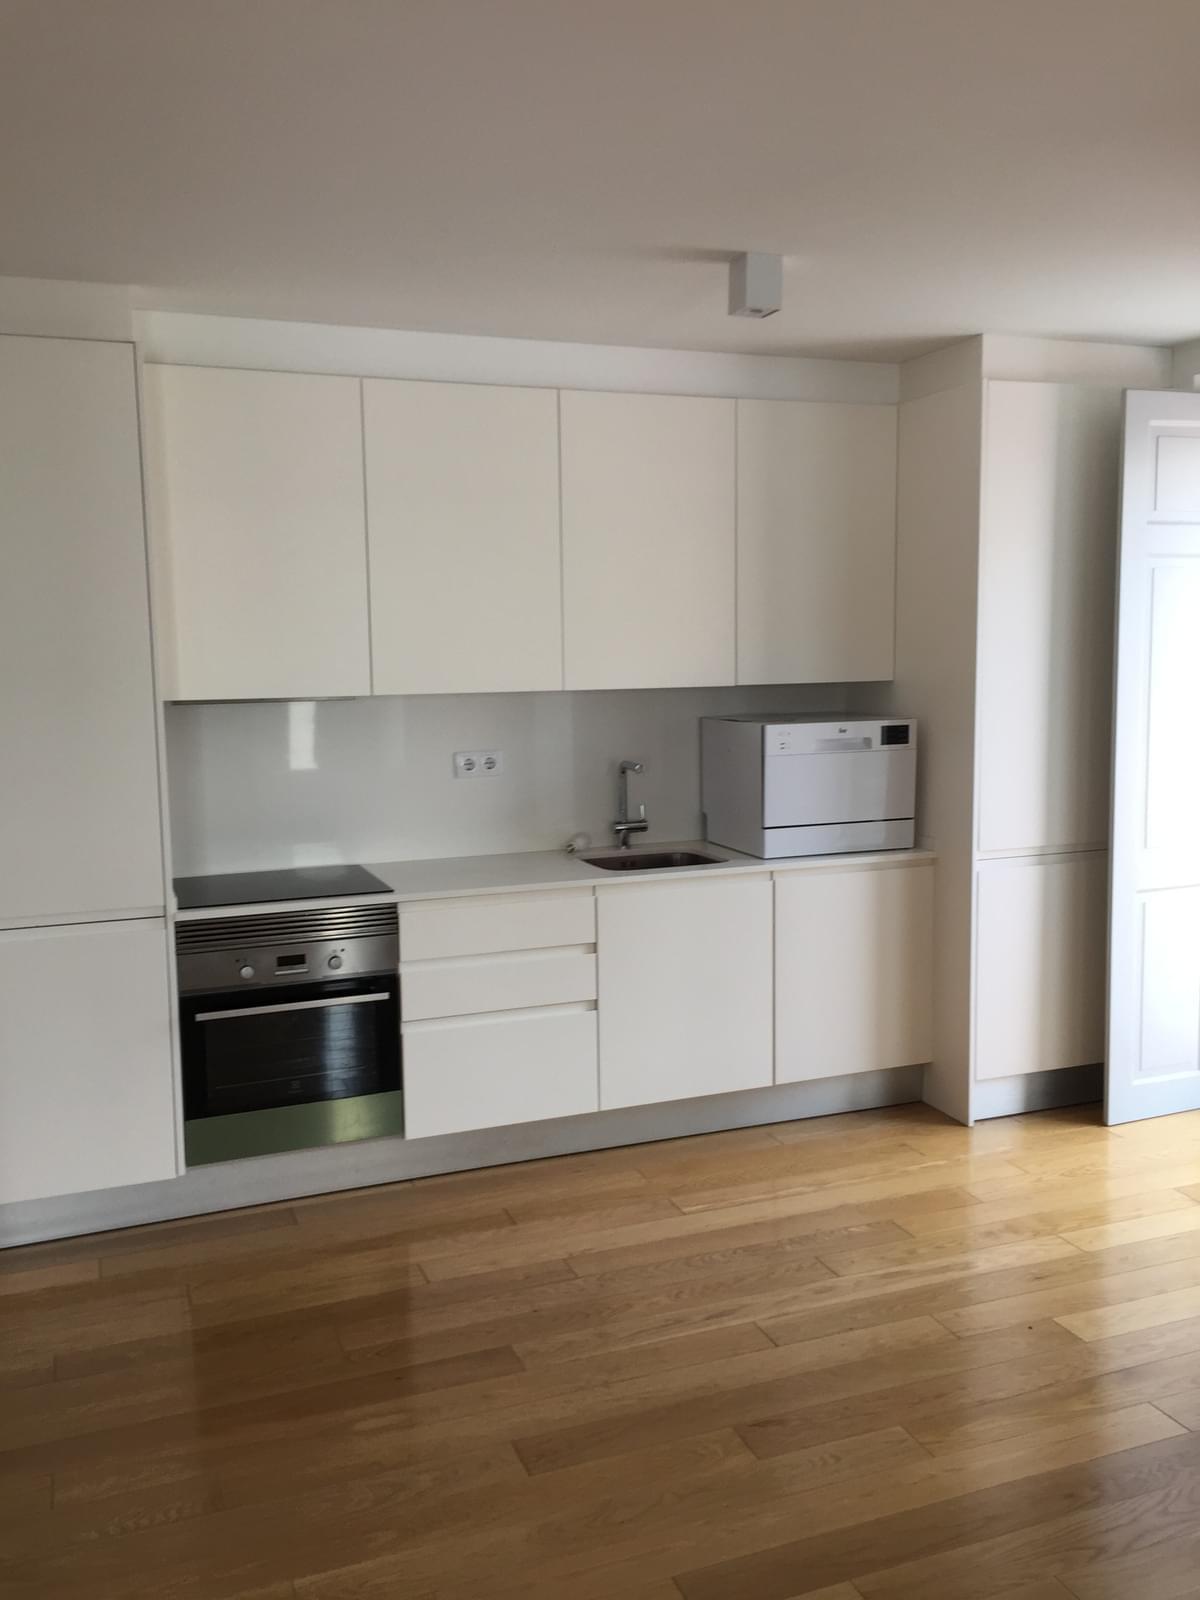 pf19228-apartamento-t1-cascais-61bcf674-cf5d-4f16-8681-939748ed840c